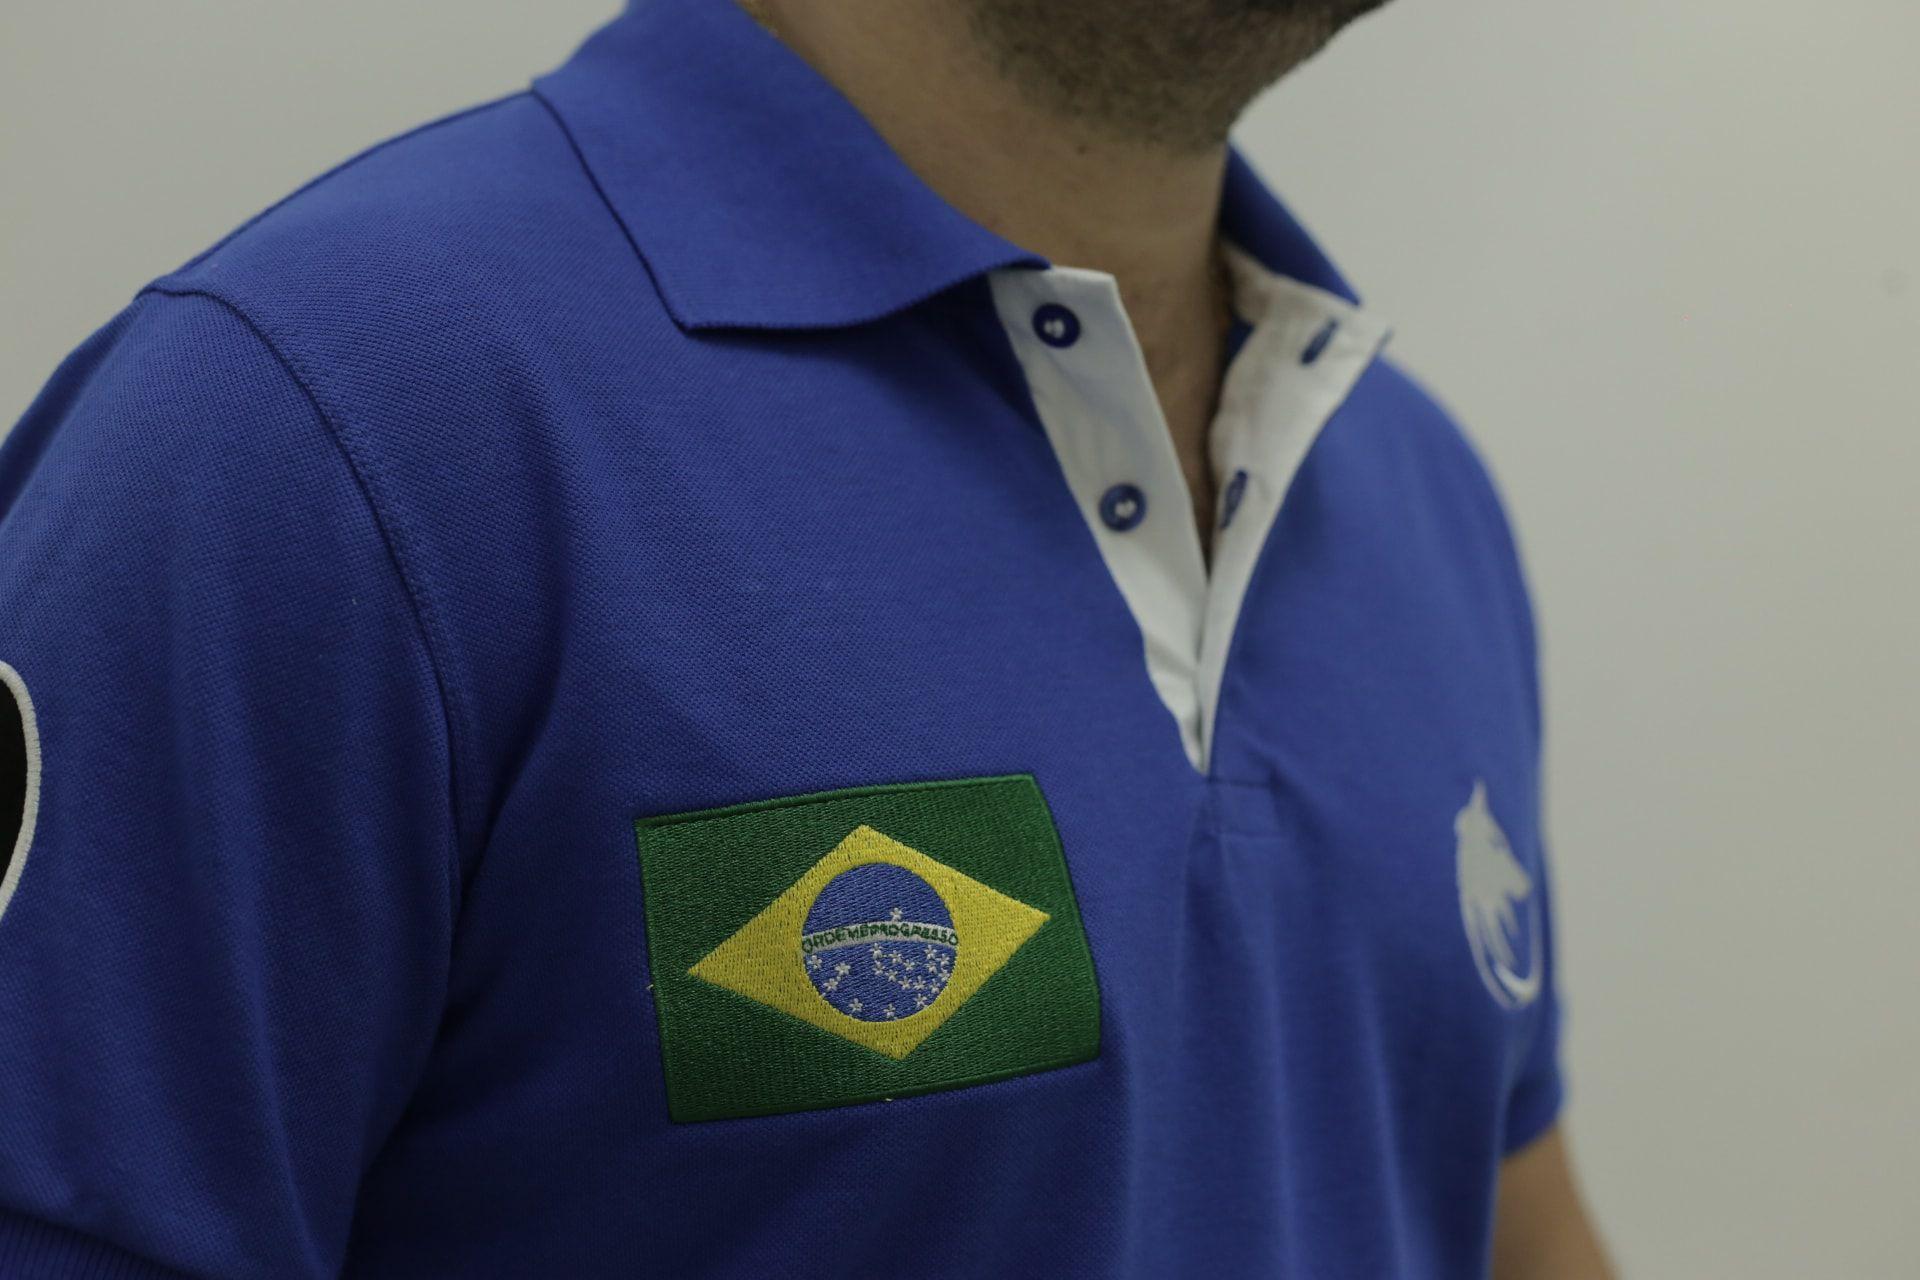 8e65d9c46ad5b Camisa Polo Brasil Lobo Cekock Azul Royal - Cekock A Marca do Lobo